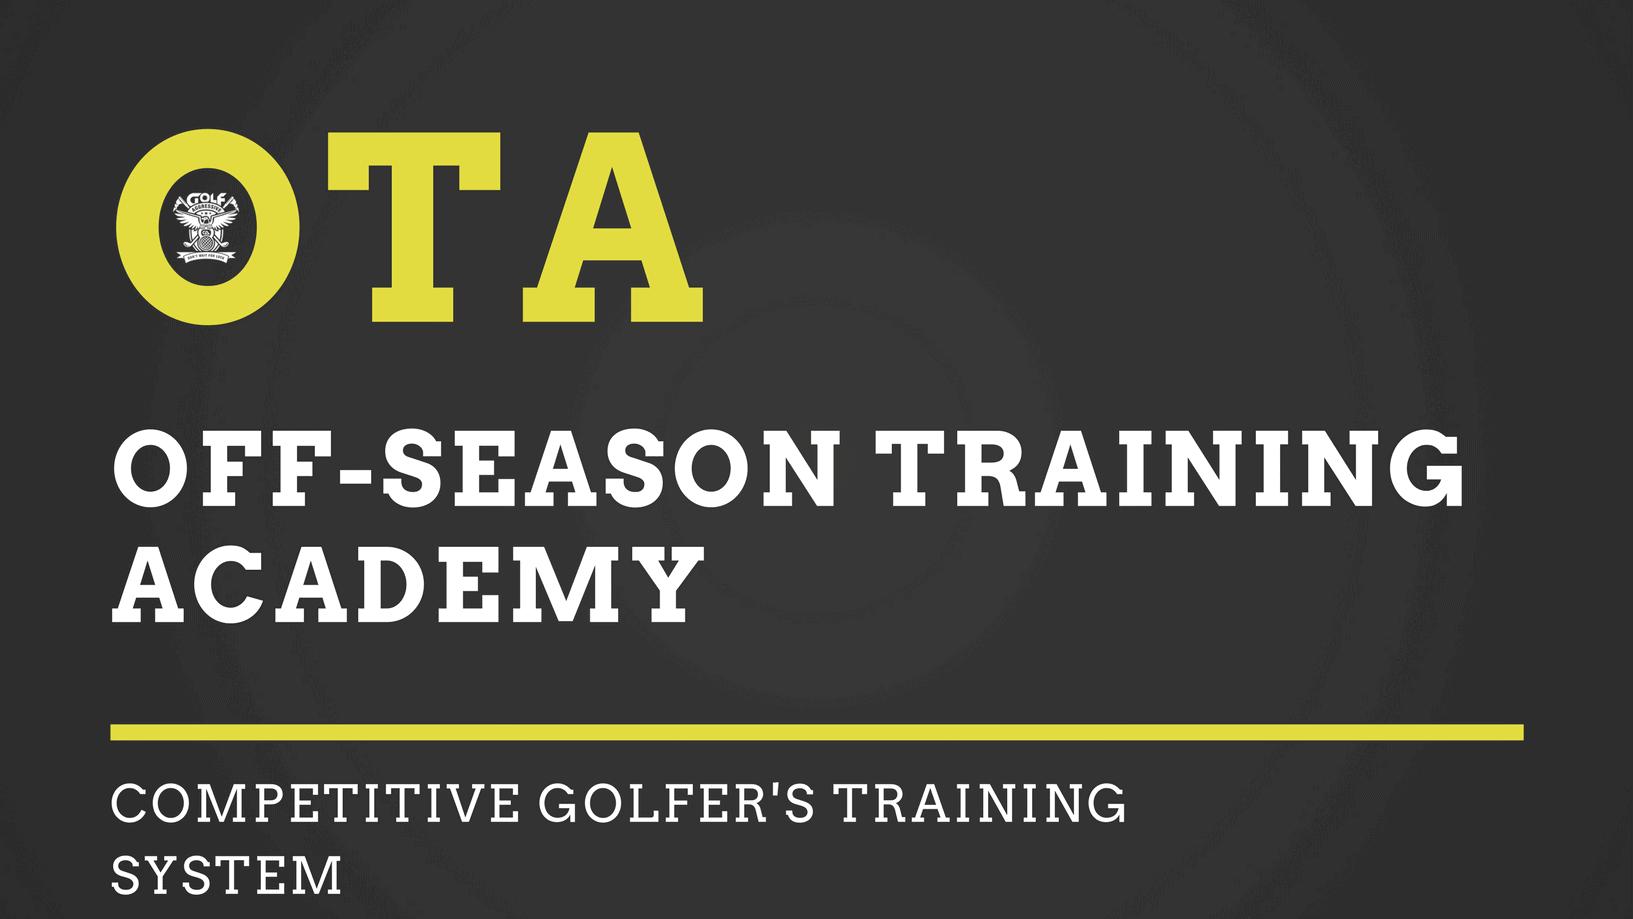 OTA: Off-Season Training Academy